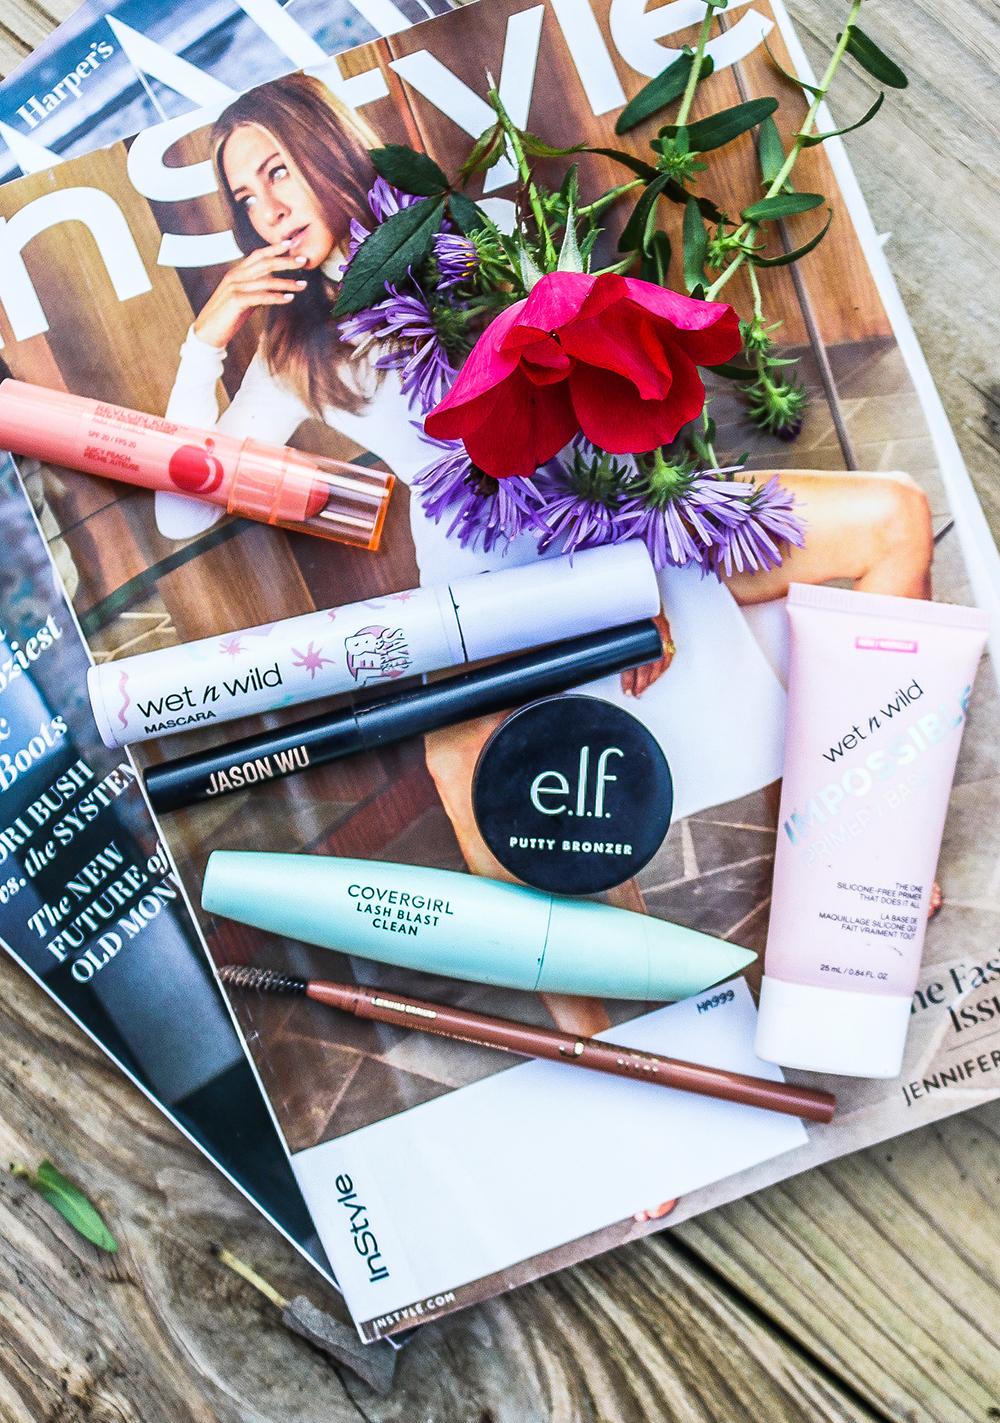 Best 2021 Drugstore Makeup Releases I DreaminLace.com #beautyblog #makeup